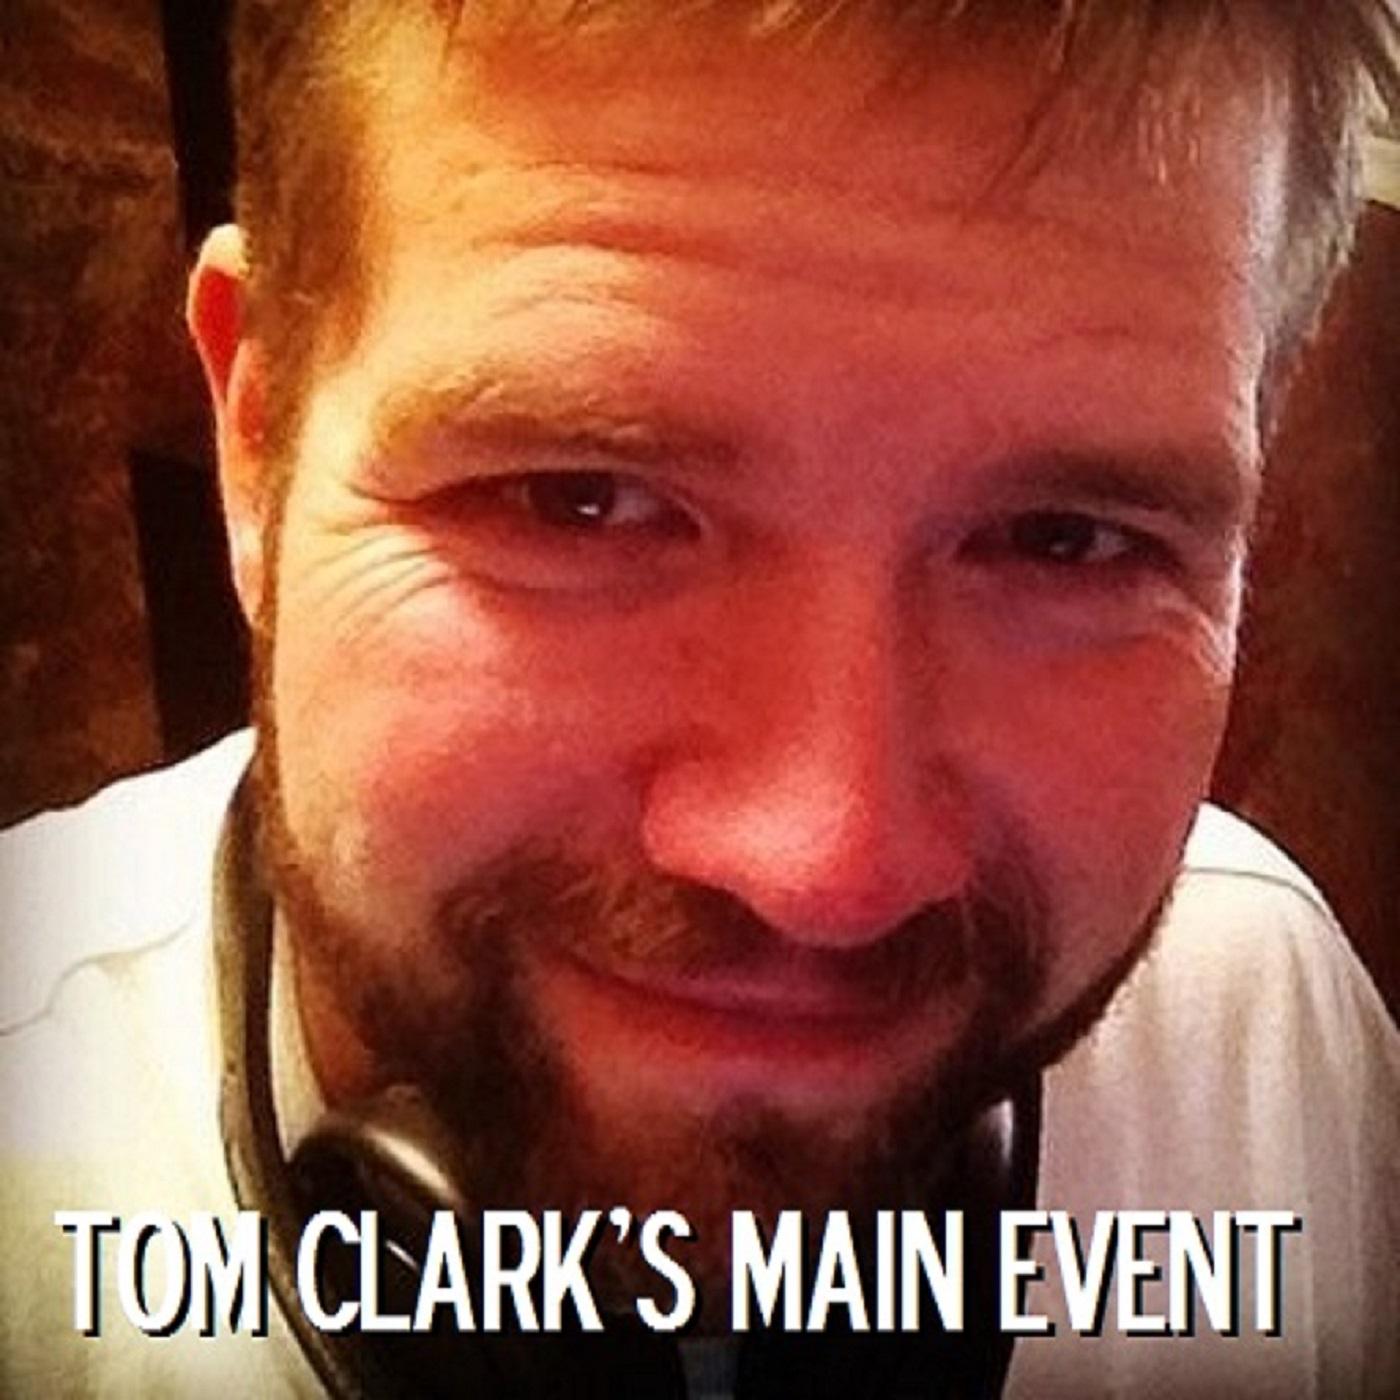 Tom Clark's Main Event